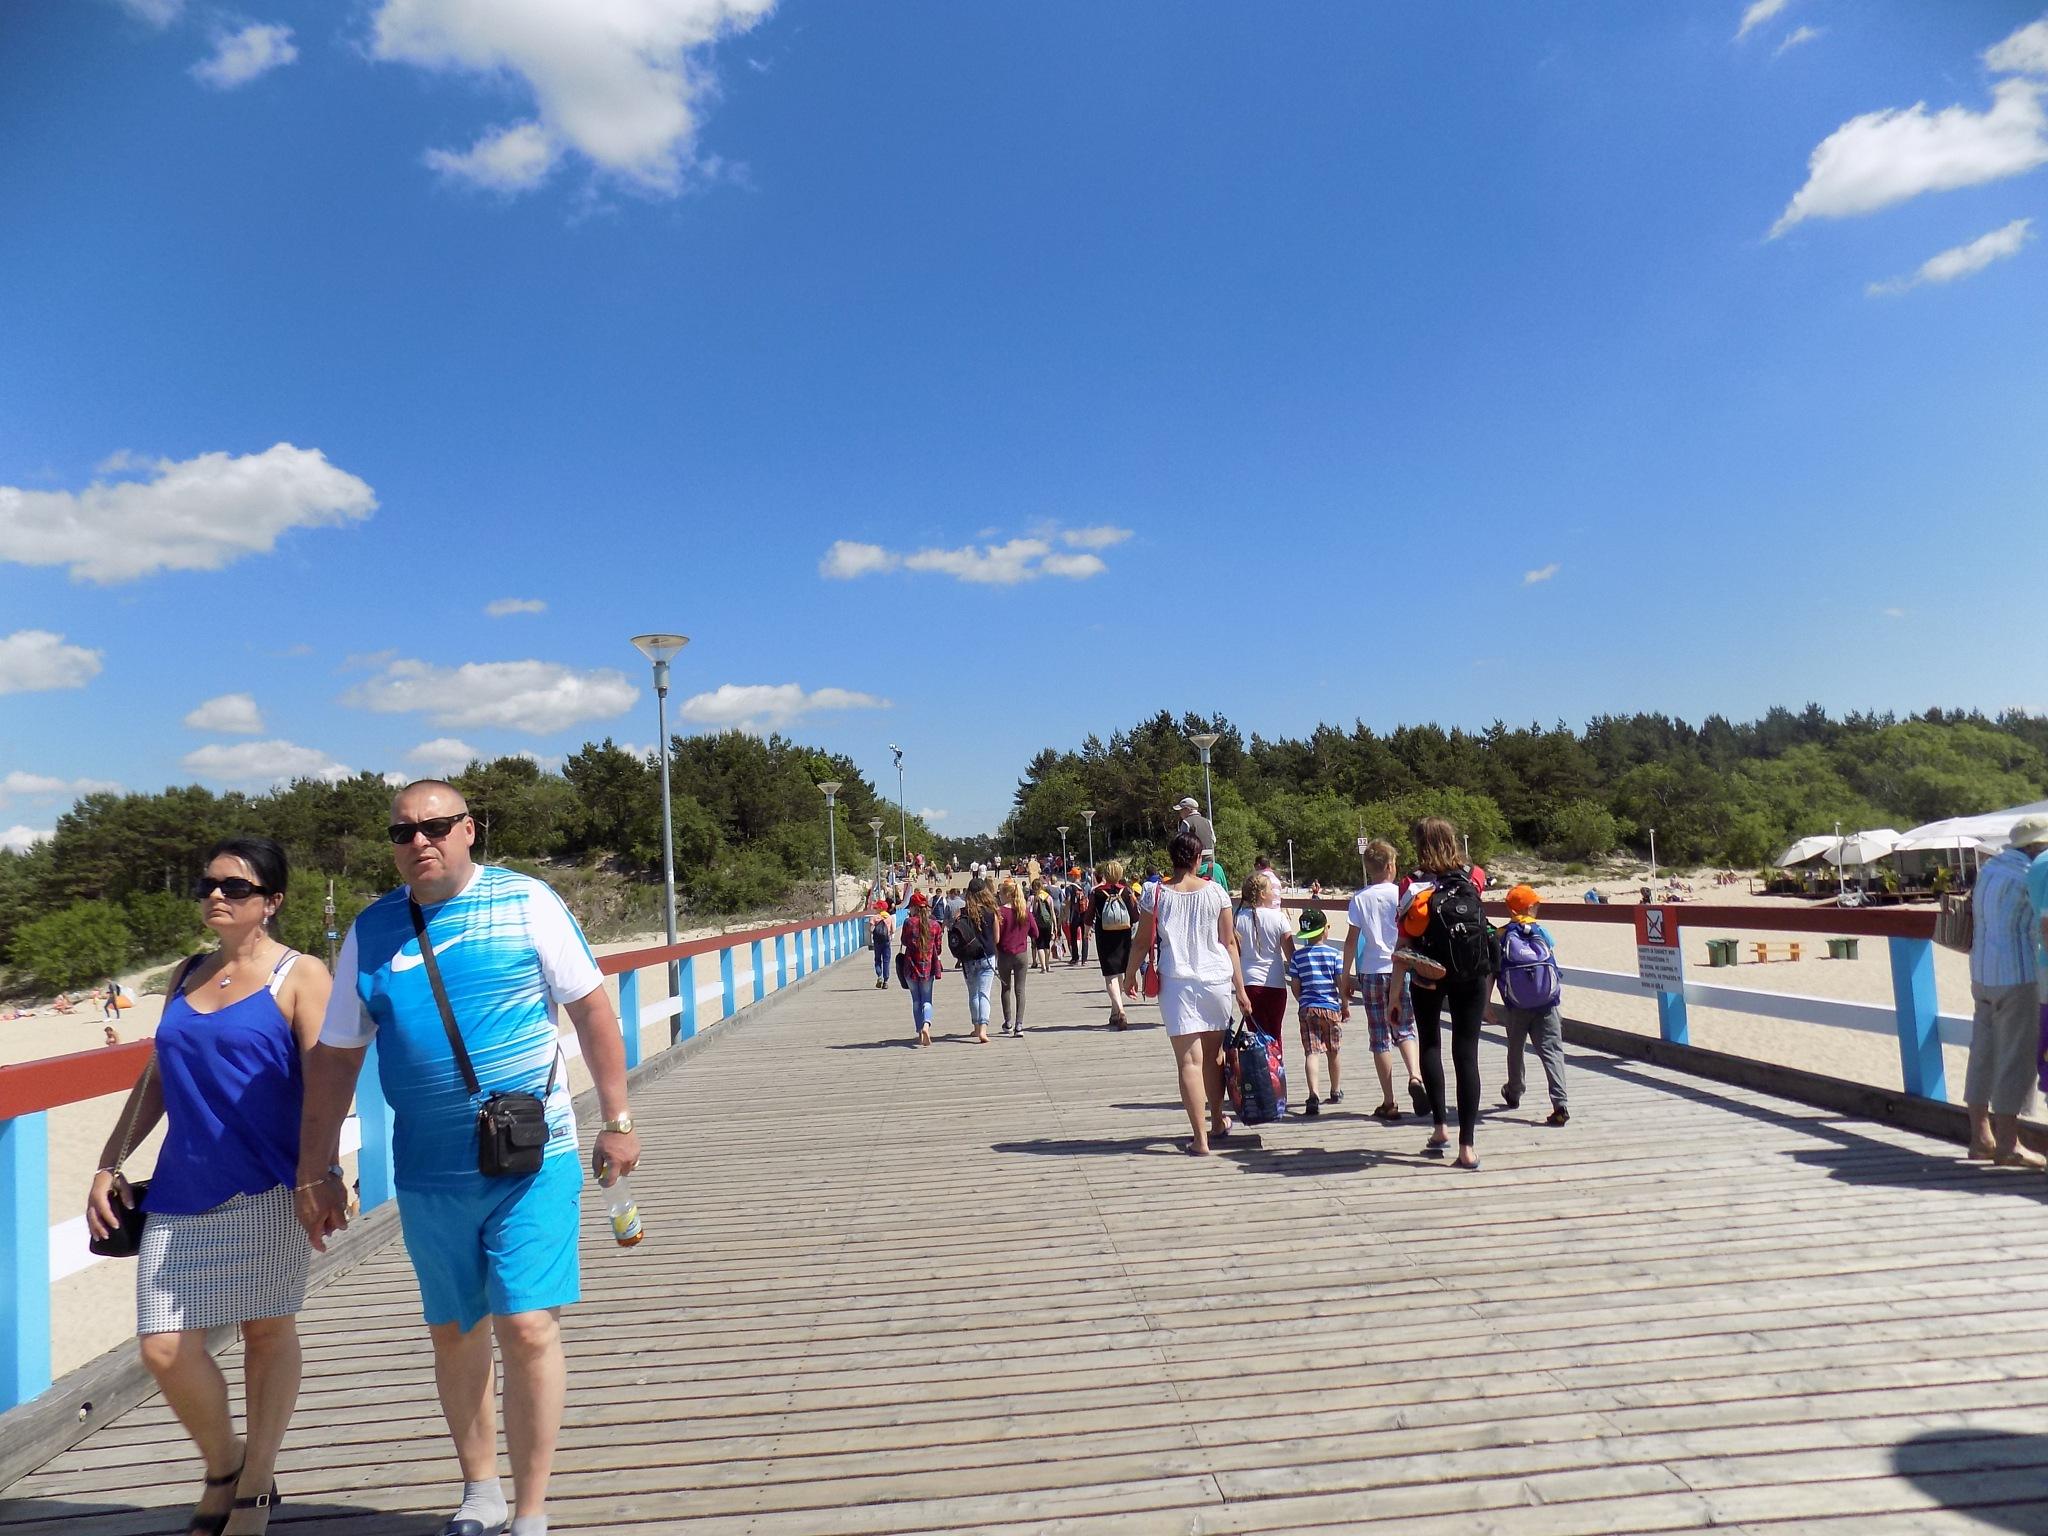 On the sea bridge by uzkuraitiene62